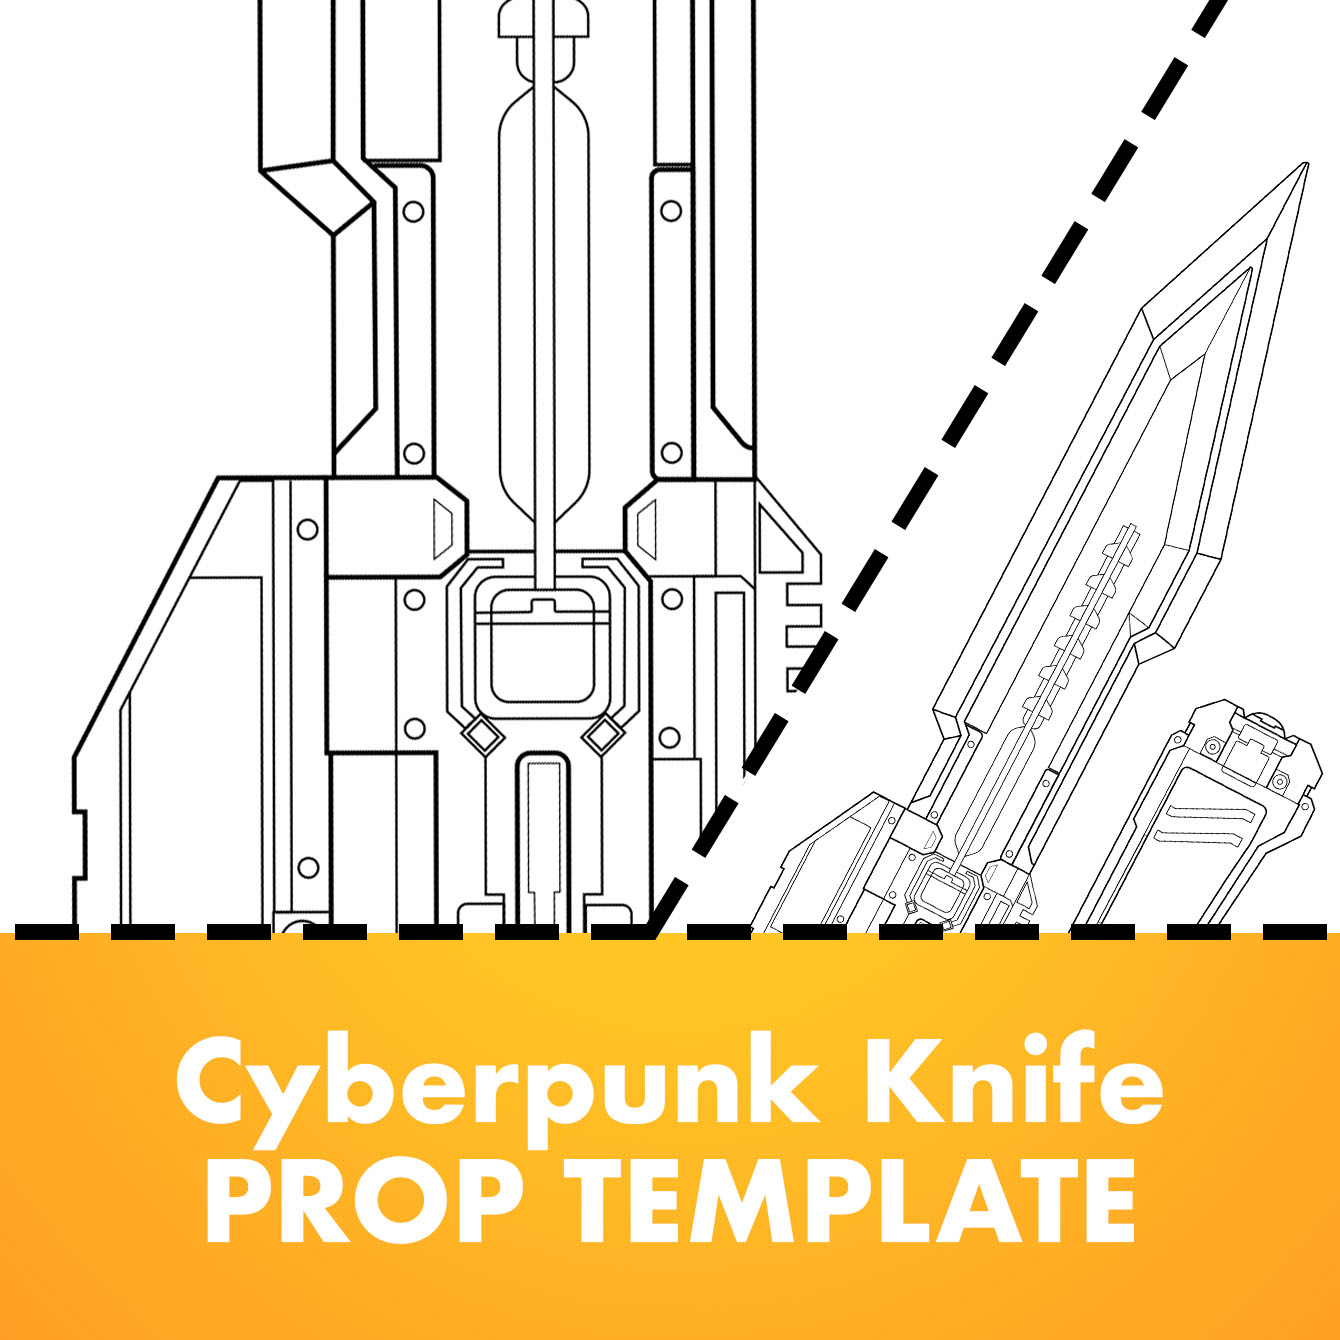 Cyberpunk_Knife_Cover.jpg